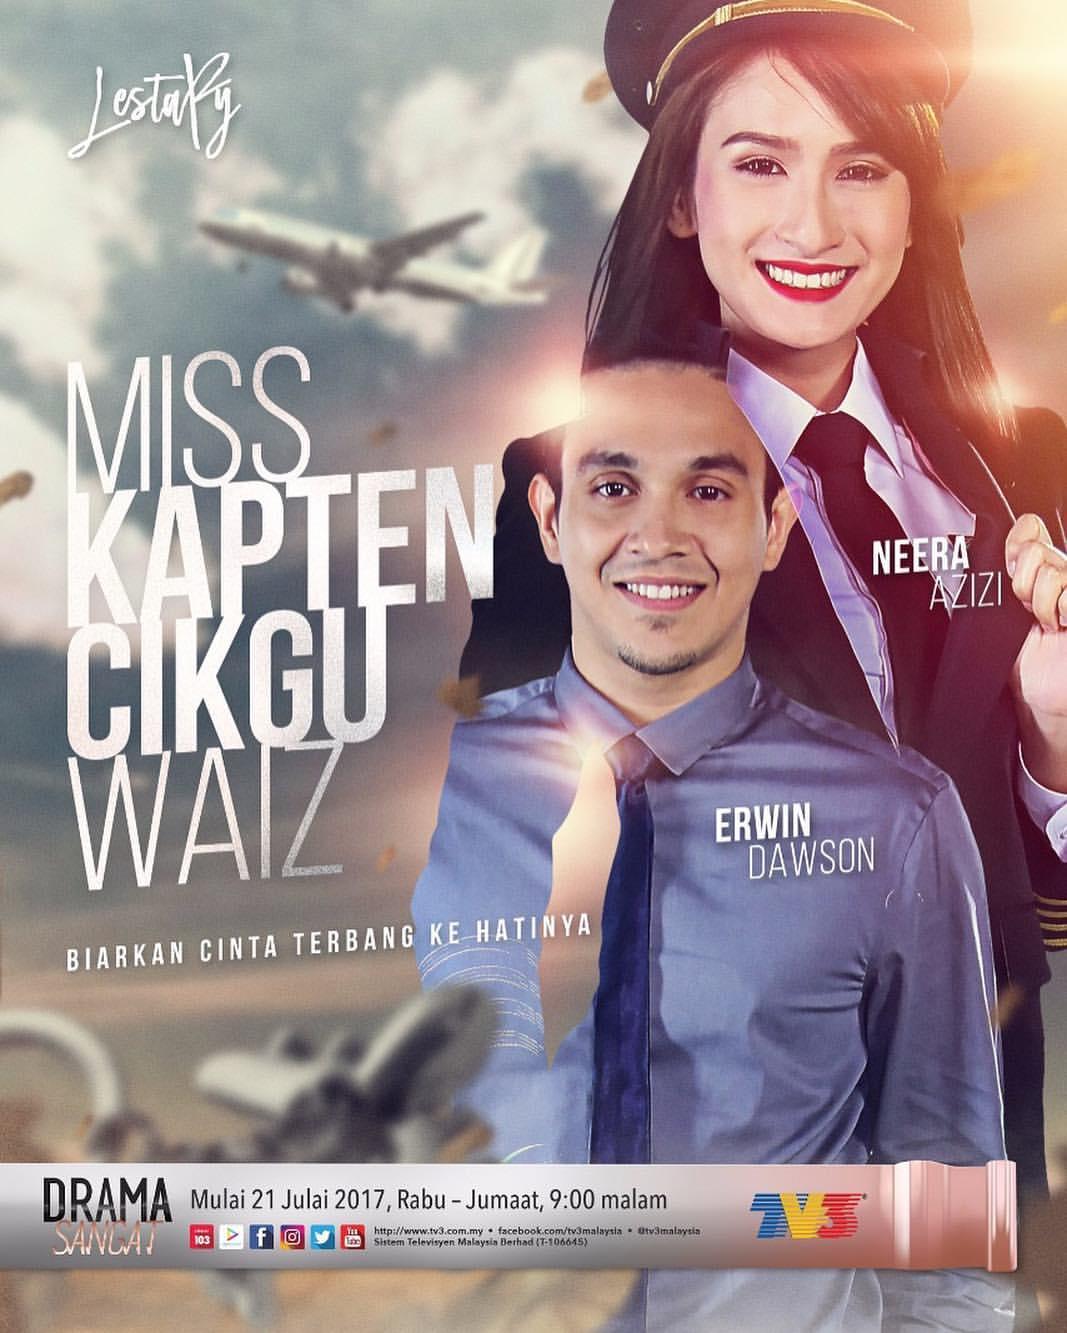 Miss Kapten Cikgu Waiz Lakonan Neera Azizi Dan Erwin Dawson